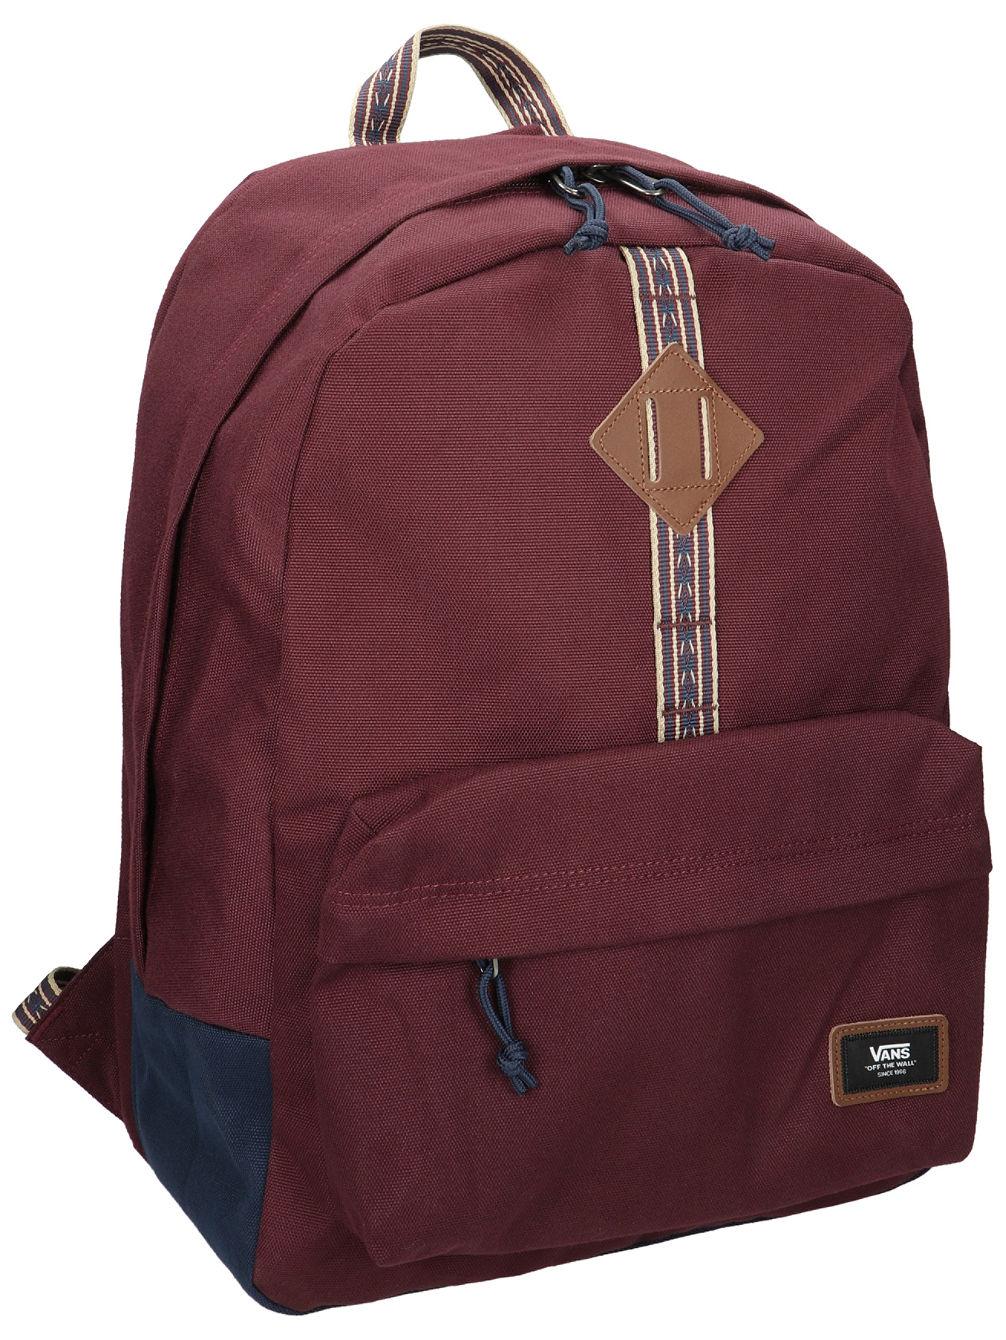 92789ca8c899 Buy Vans Old Skool Plus Backpack online at blue-tomato.com